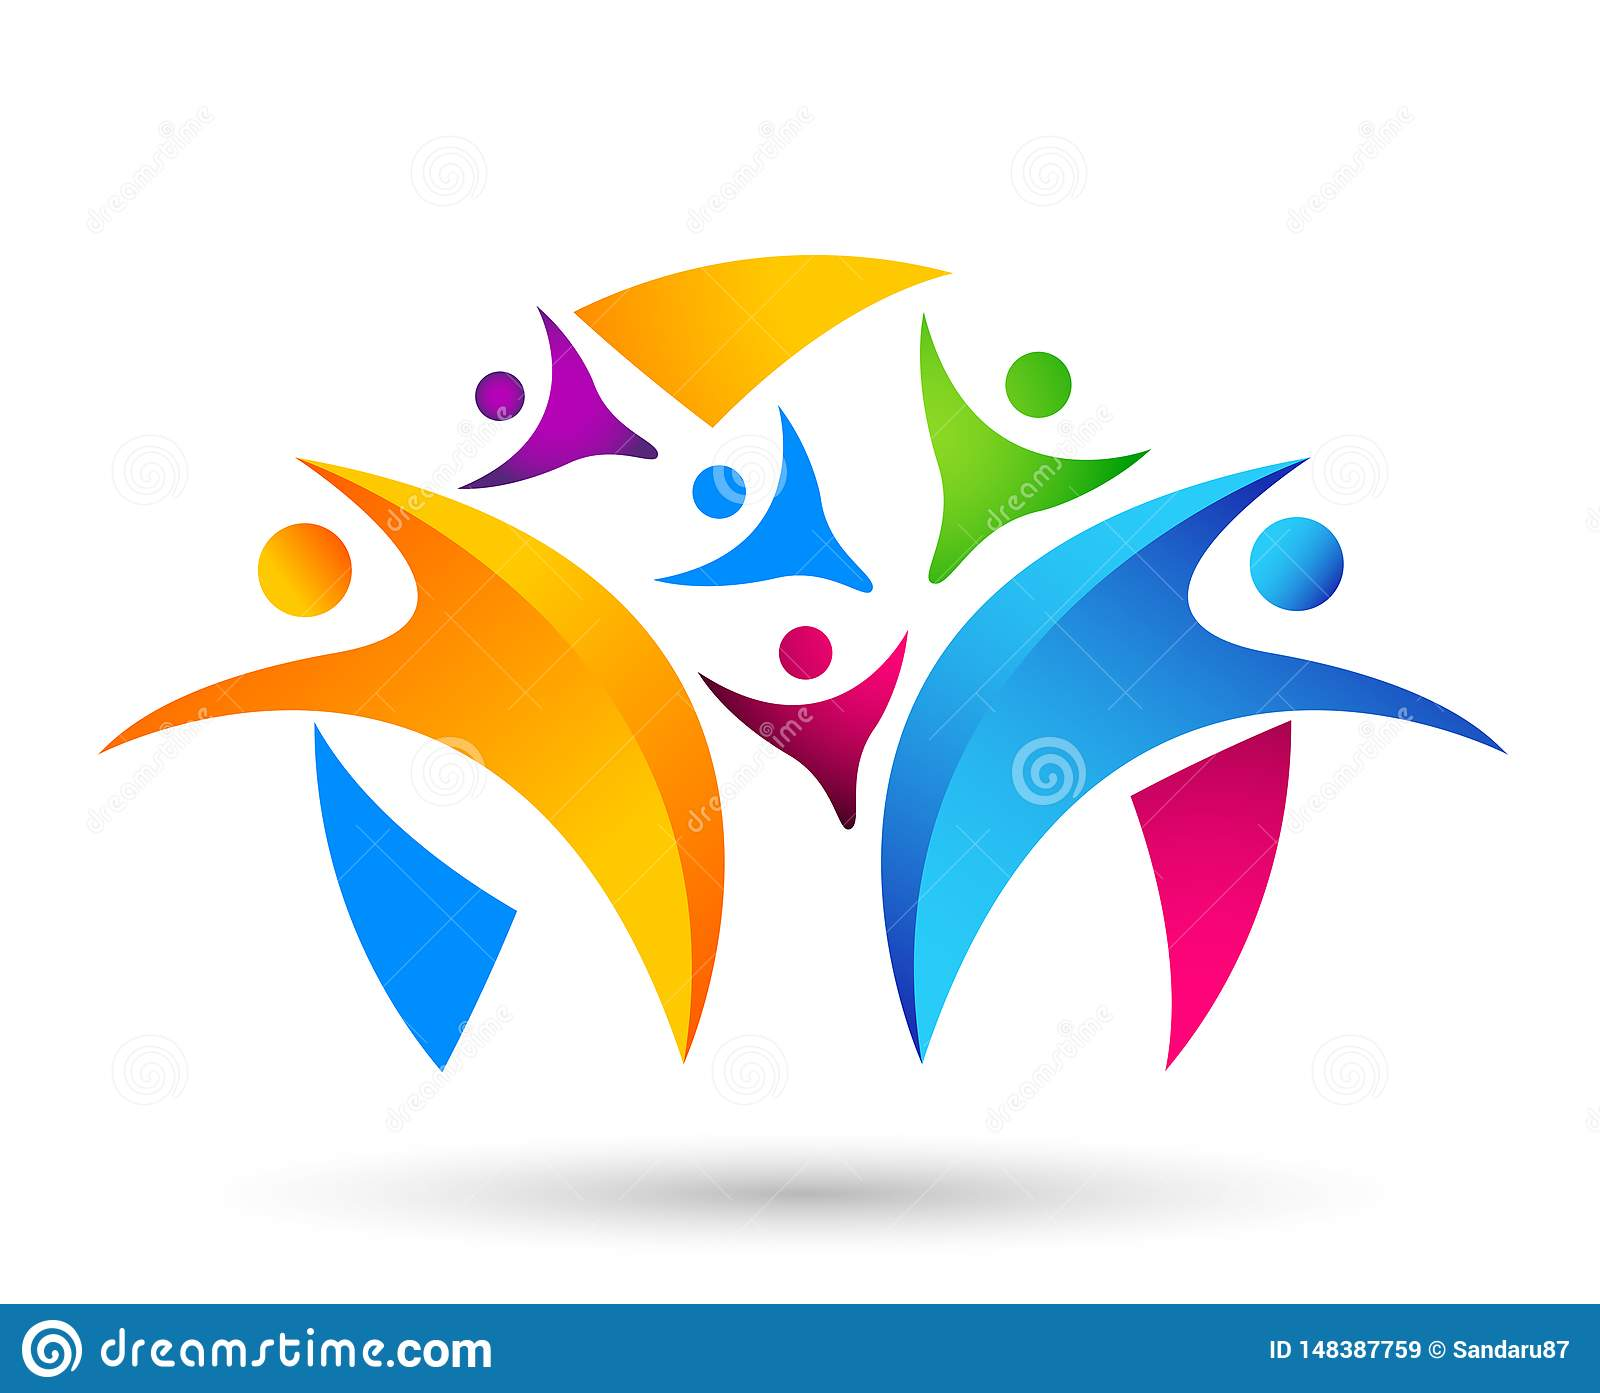 People union team work celebrating happiness wellness celebration logo healthy symbol icon element logo design on white background